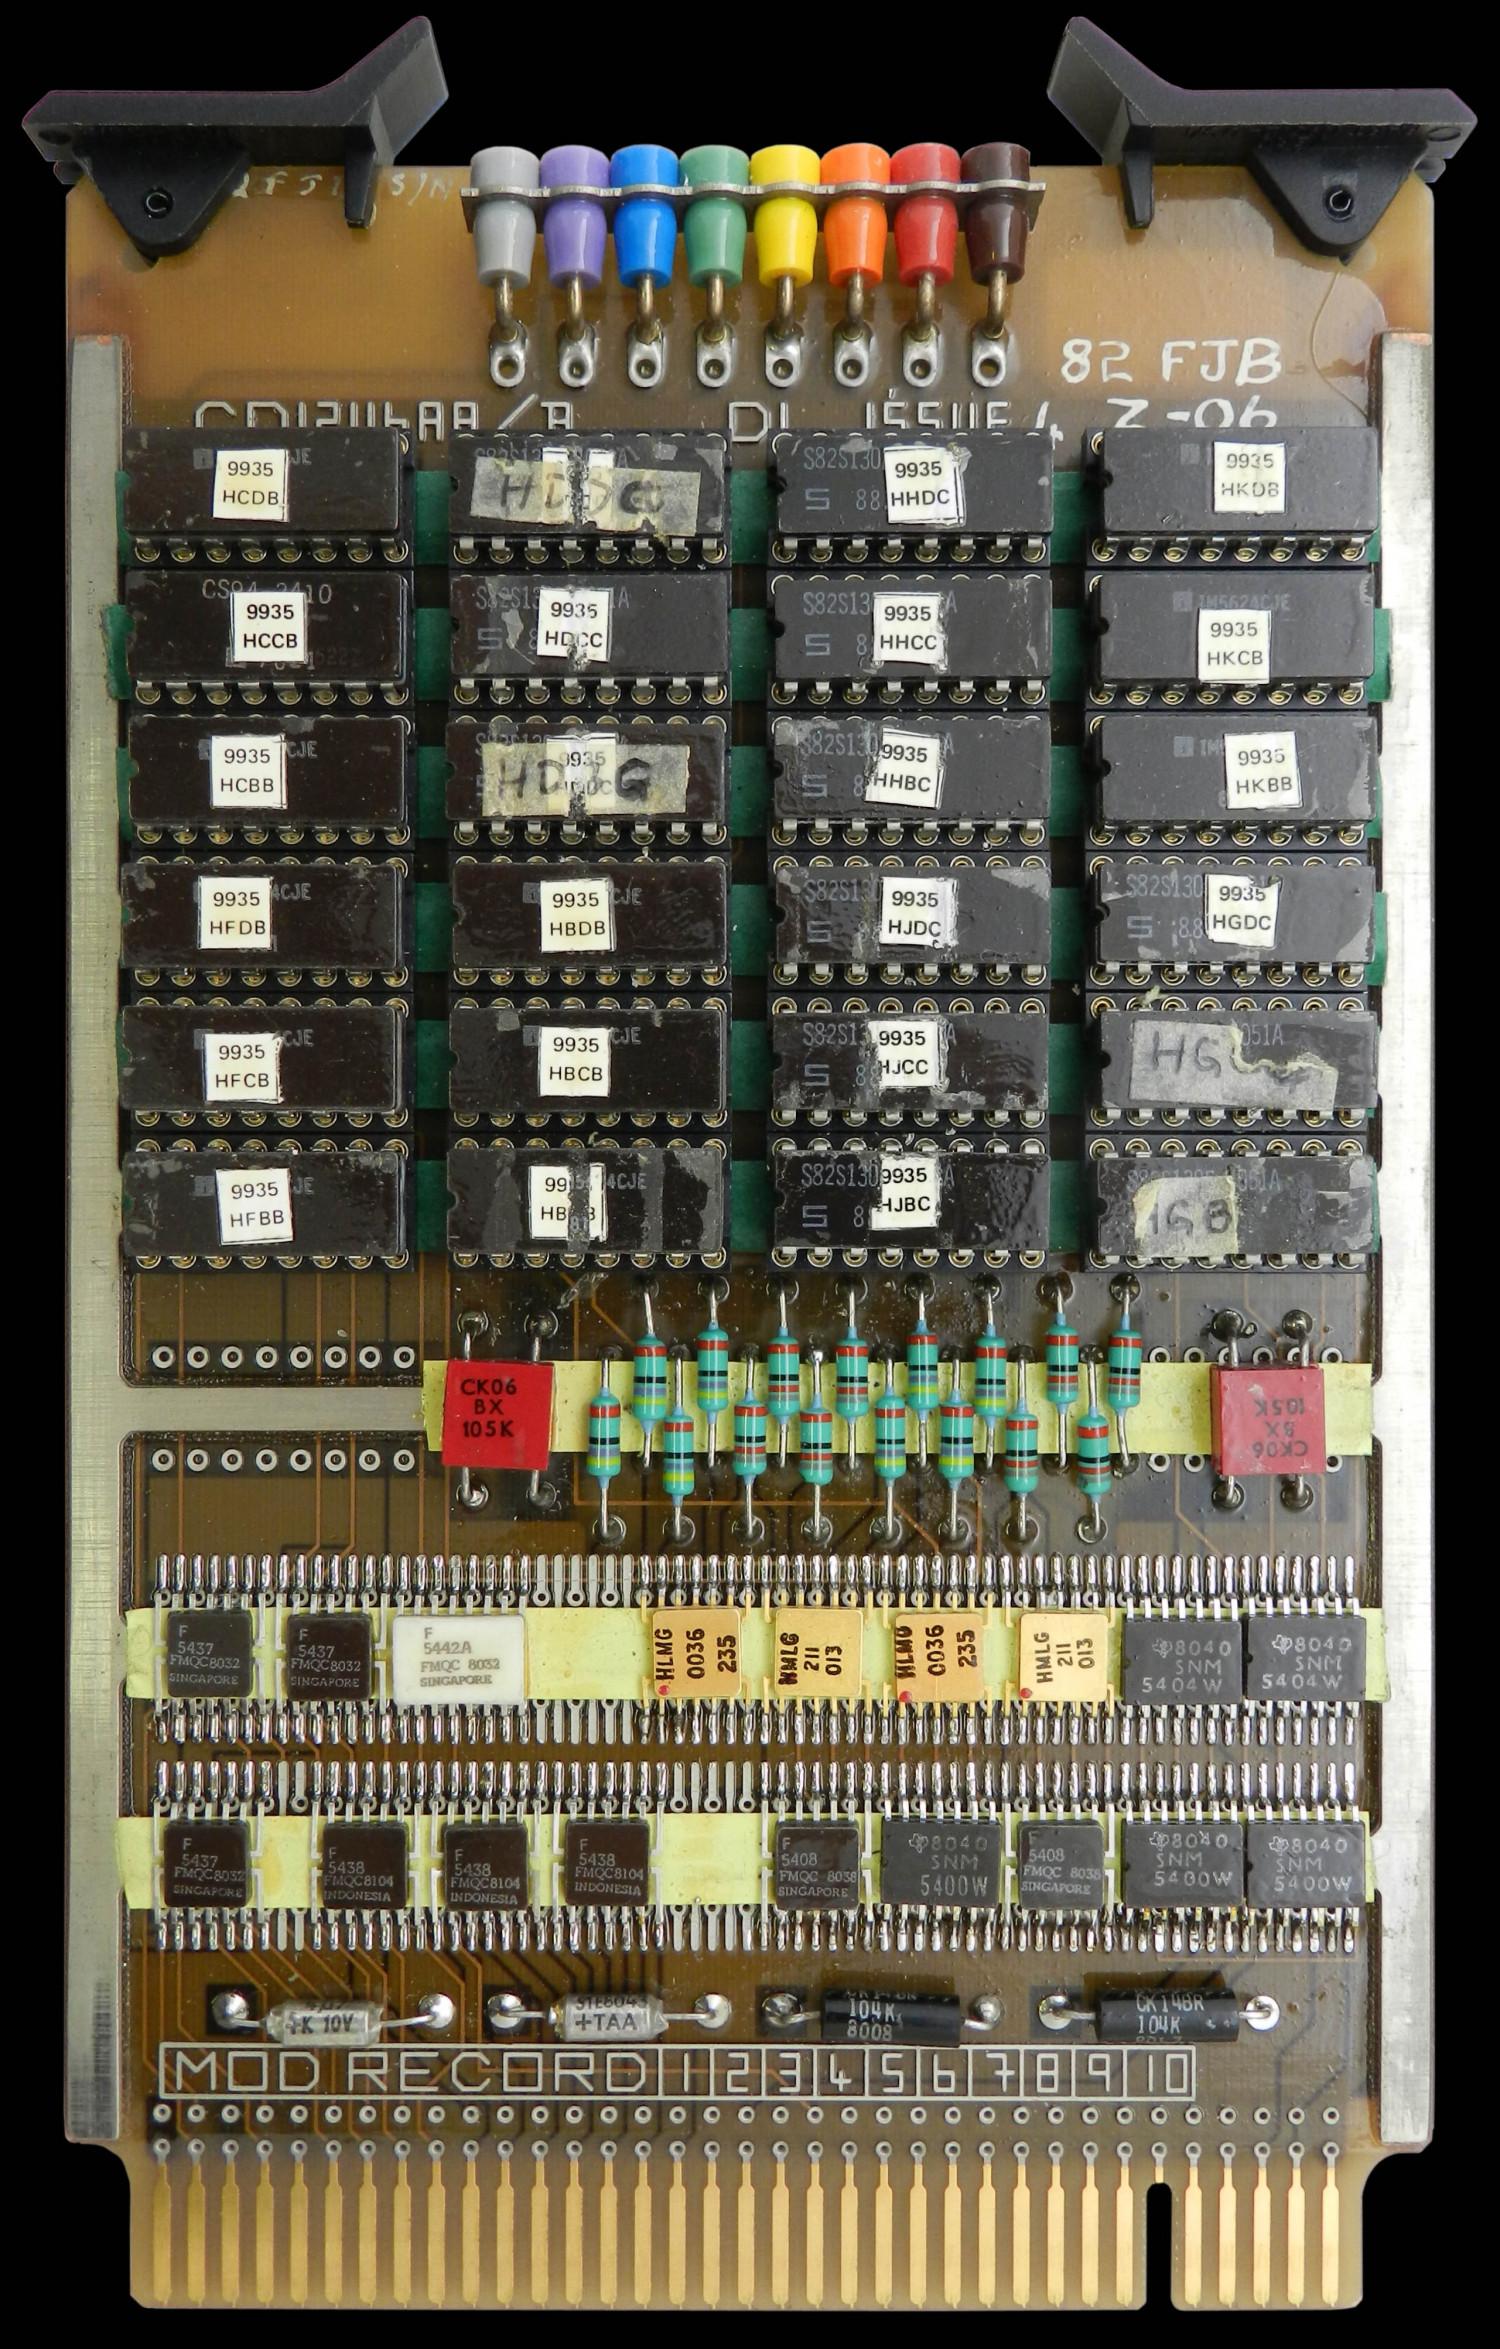 NCS1 Program Store 1 Circuit Board